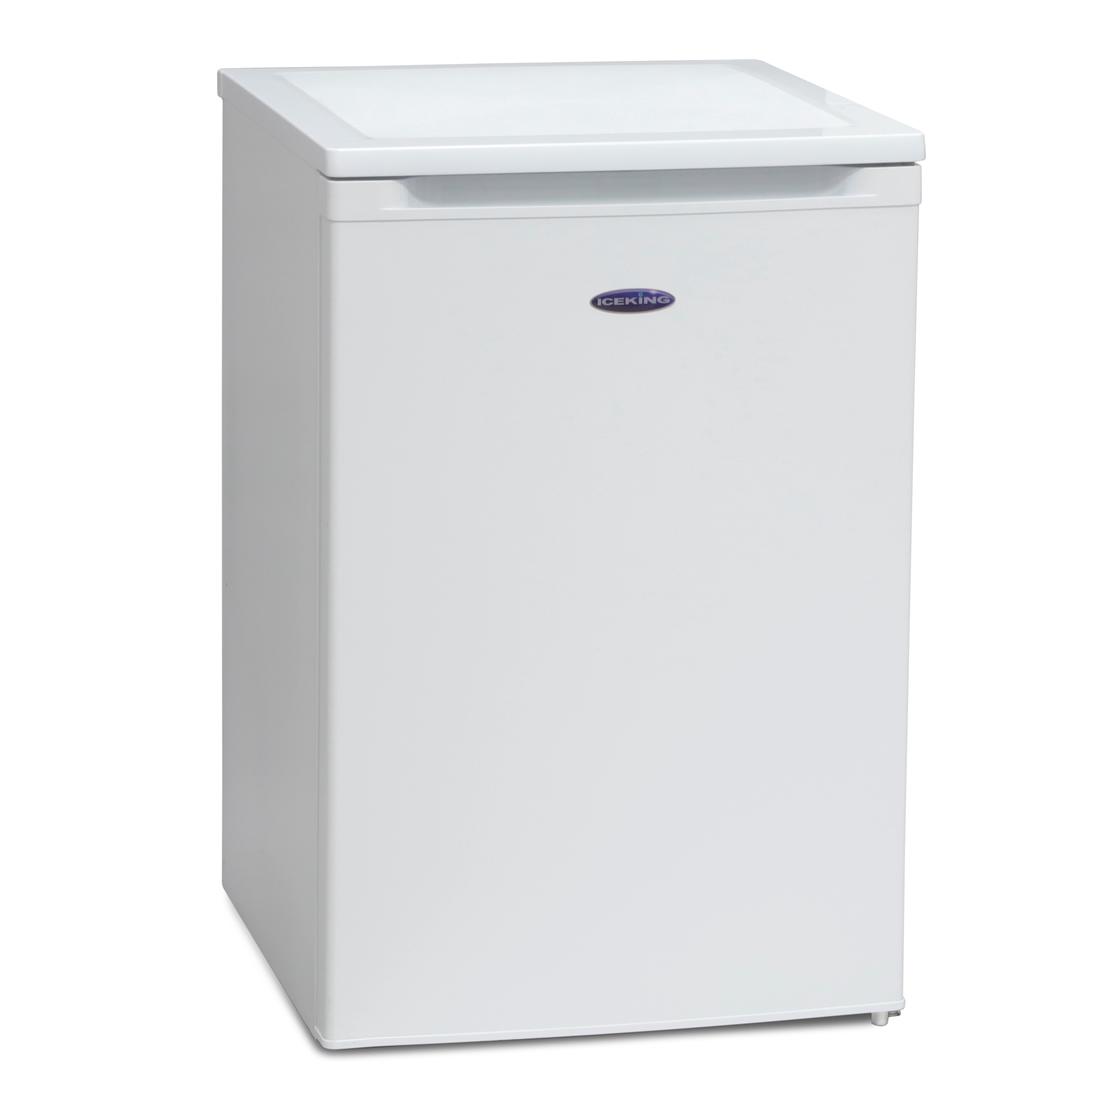 86litre Upright Freezer Class A+ White